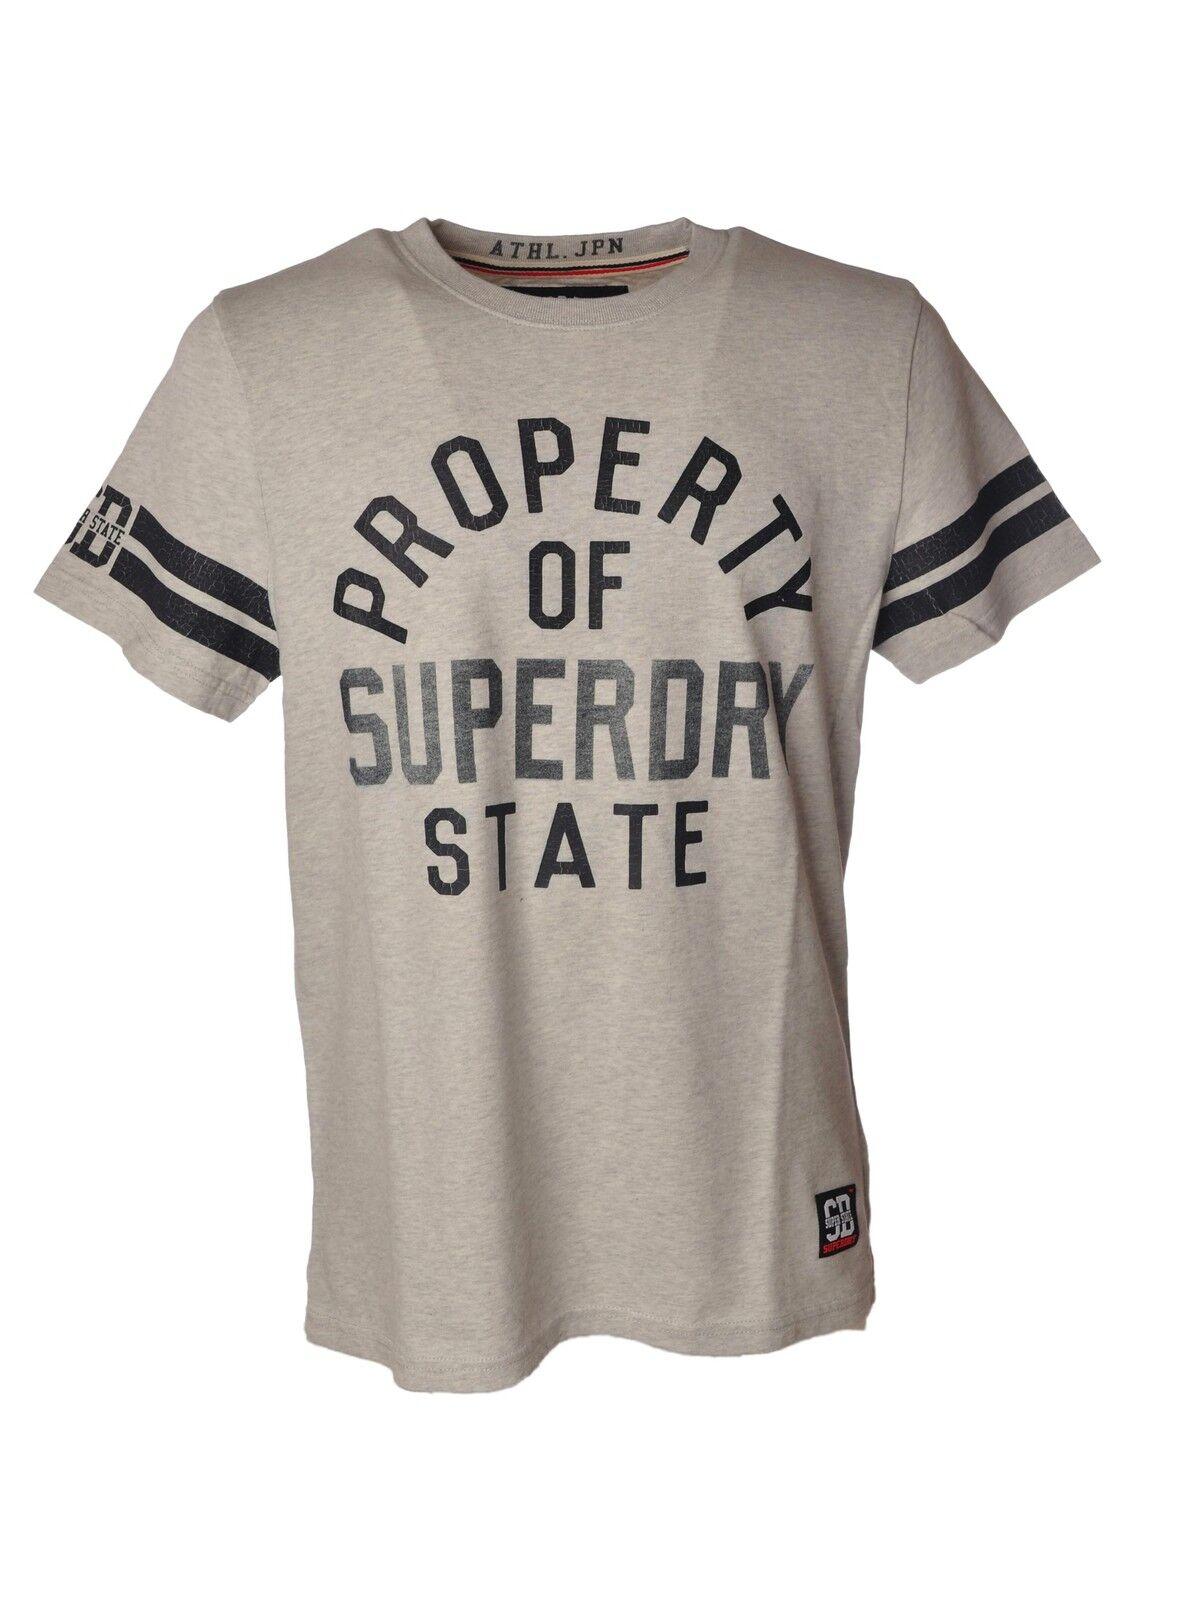 Superdry - Topwear-T-shirts - Man - Grau - 3830403N184255